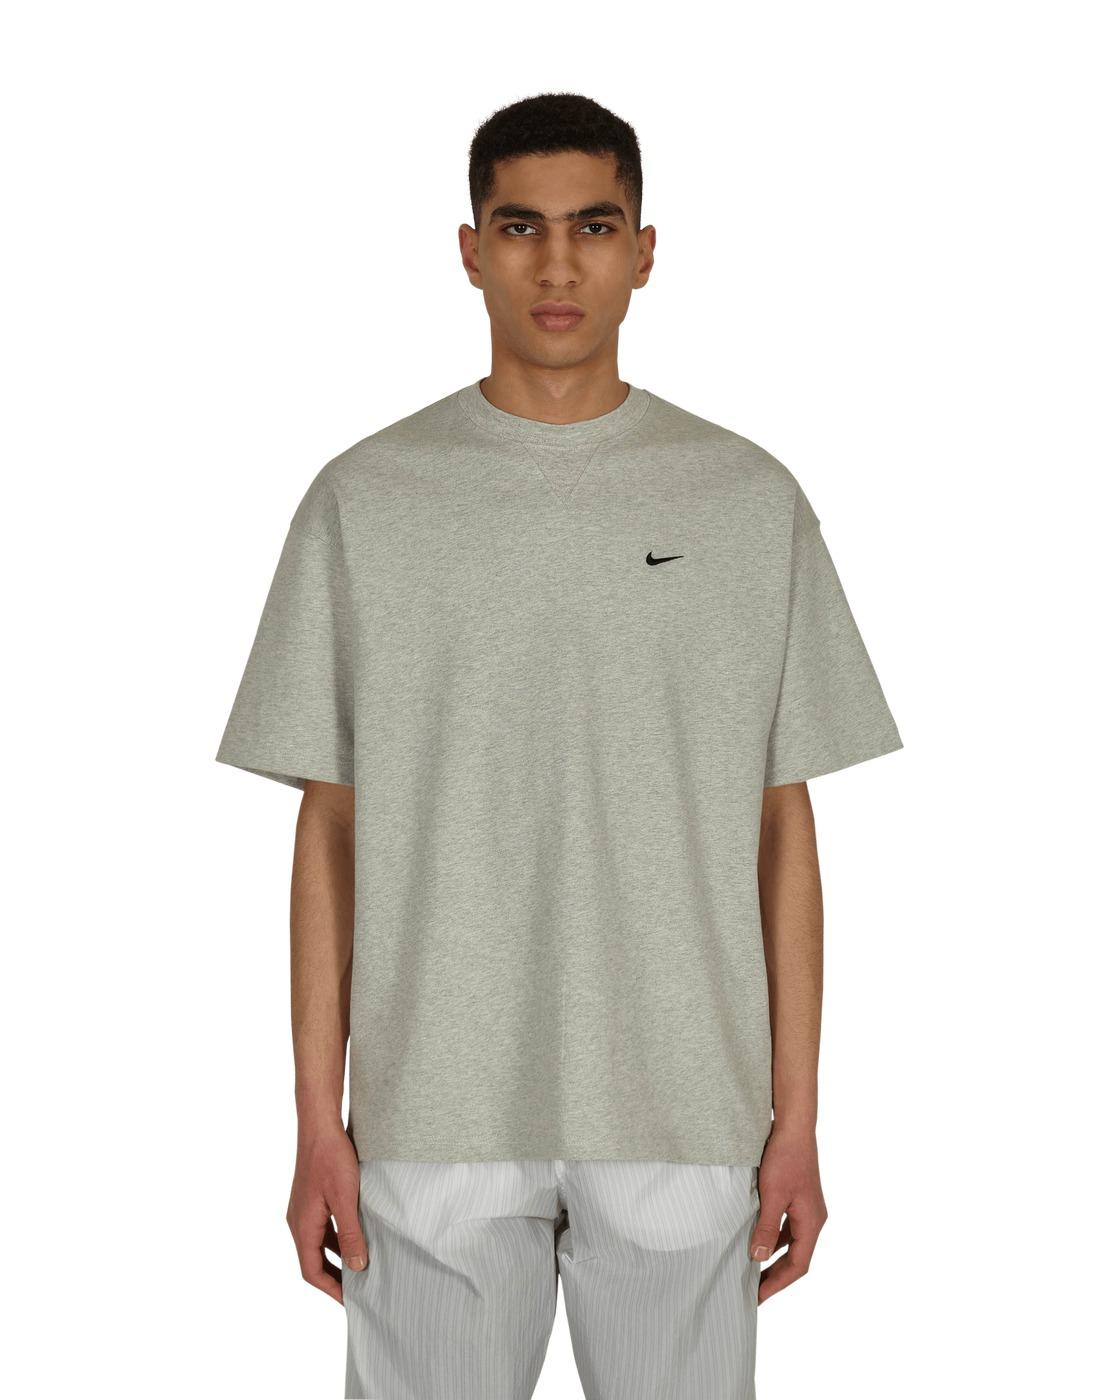 Nike Special Project Kim Jones T Shirt Grey Heather